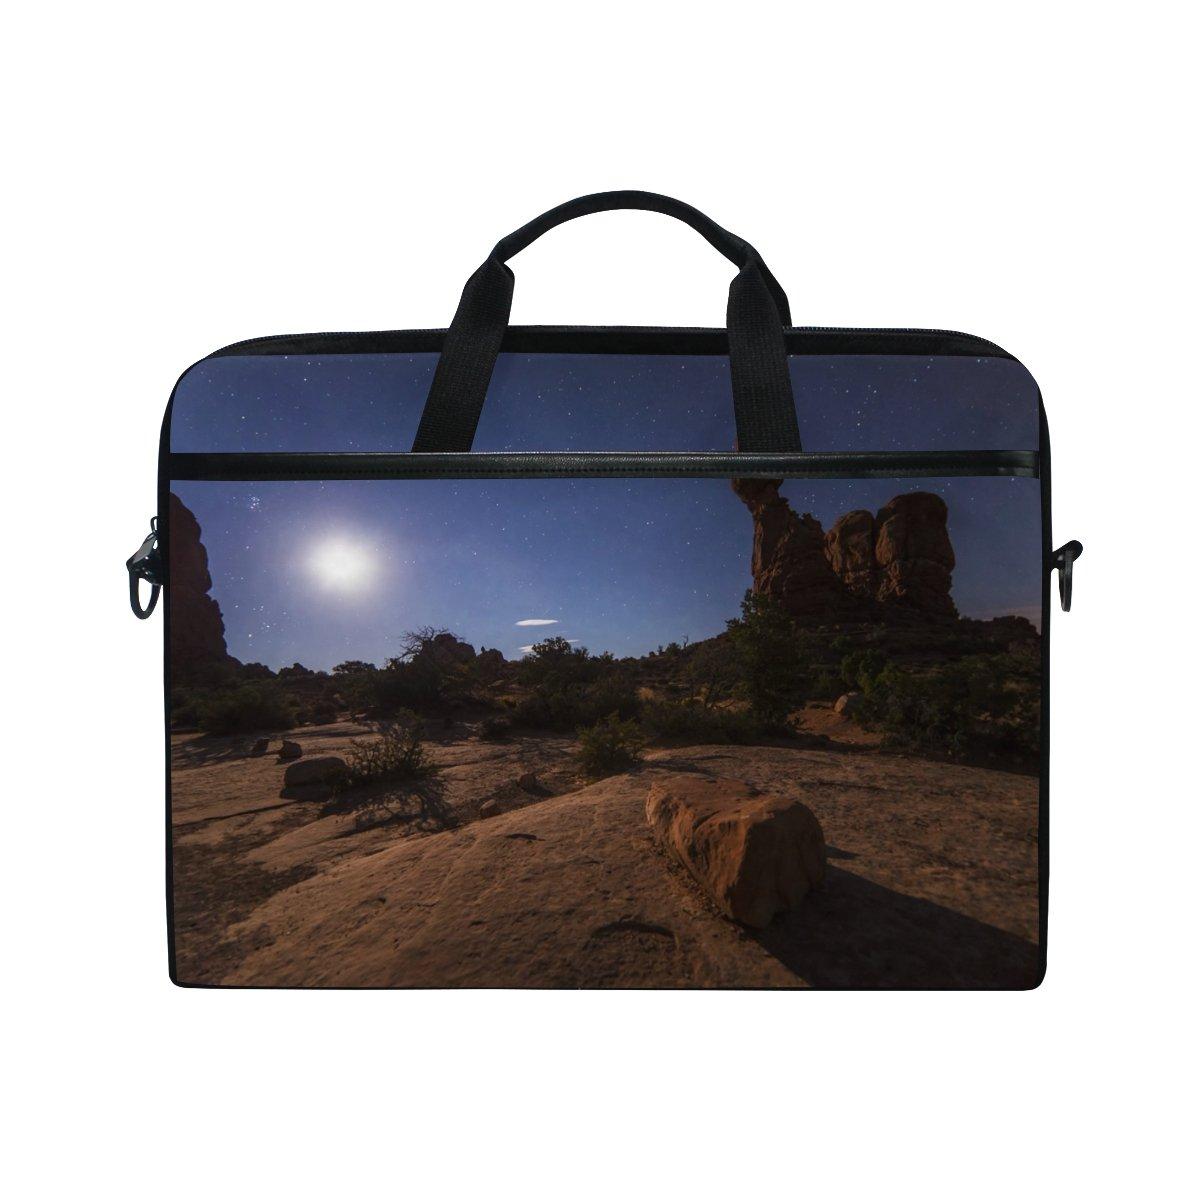 durable service Laptop Bag 15 Inch Briefcase Shoulder Messenger Bag Water  Repellent printing Laptop Bag bussiness 568664c0b6